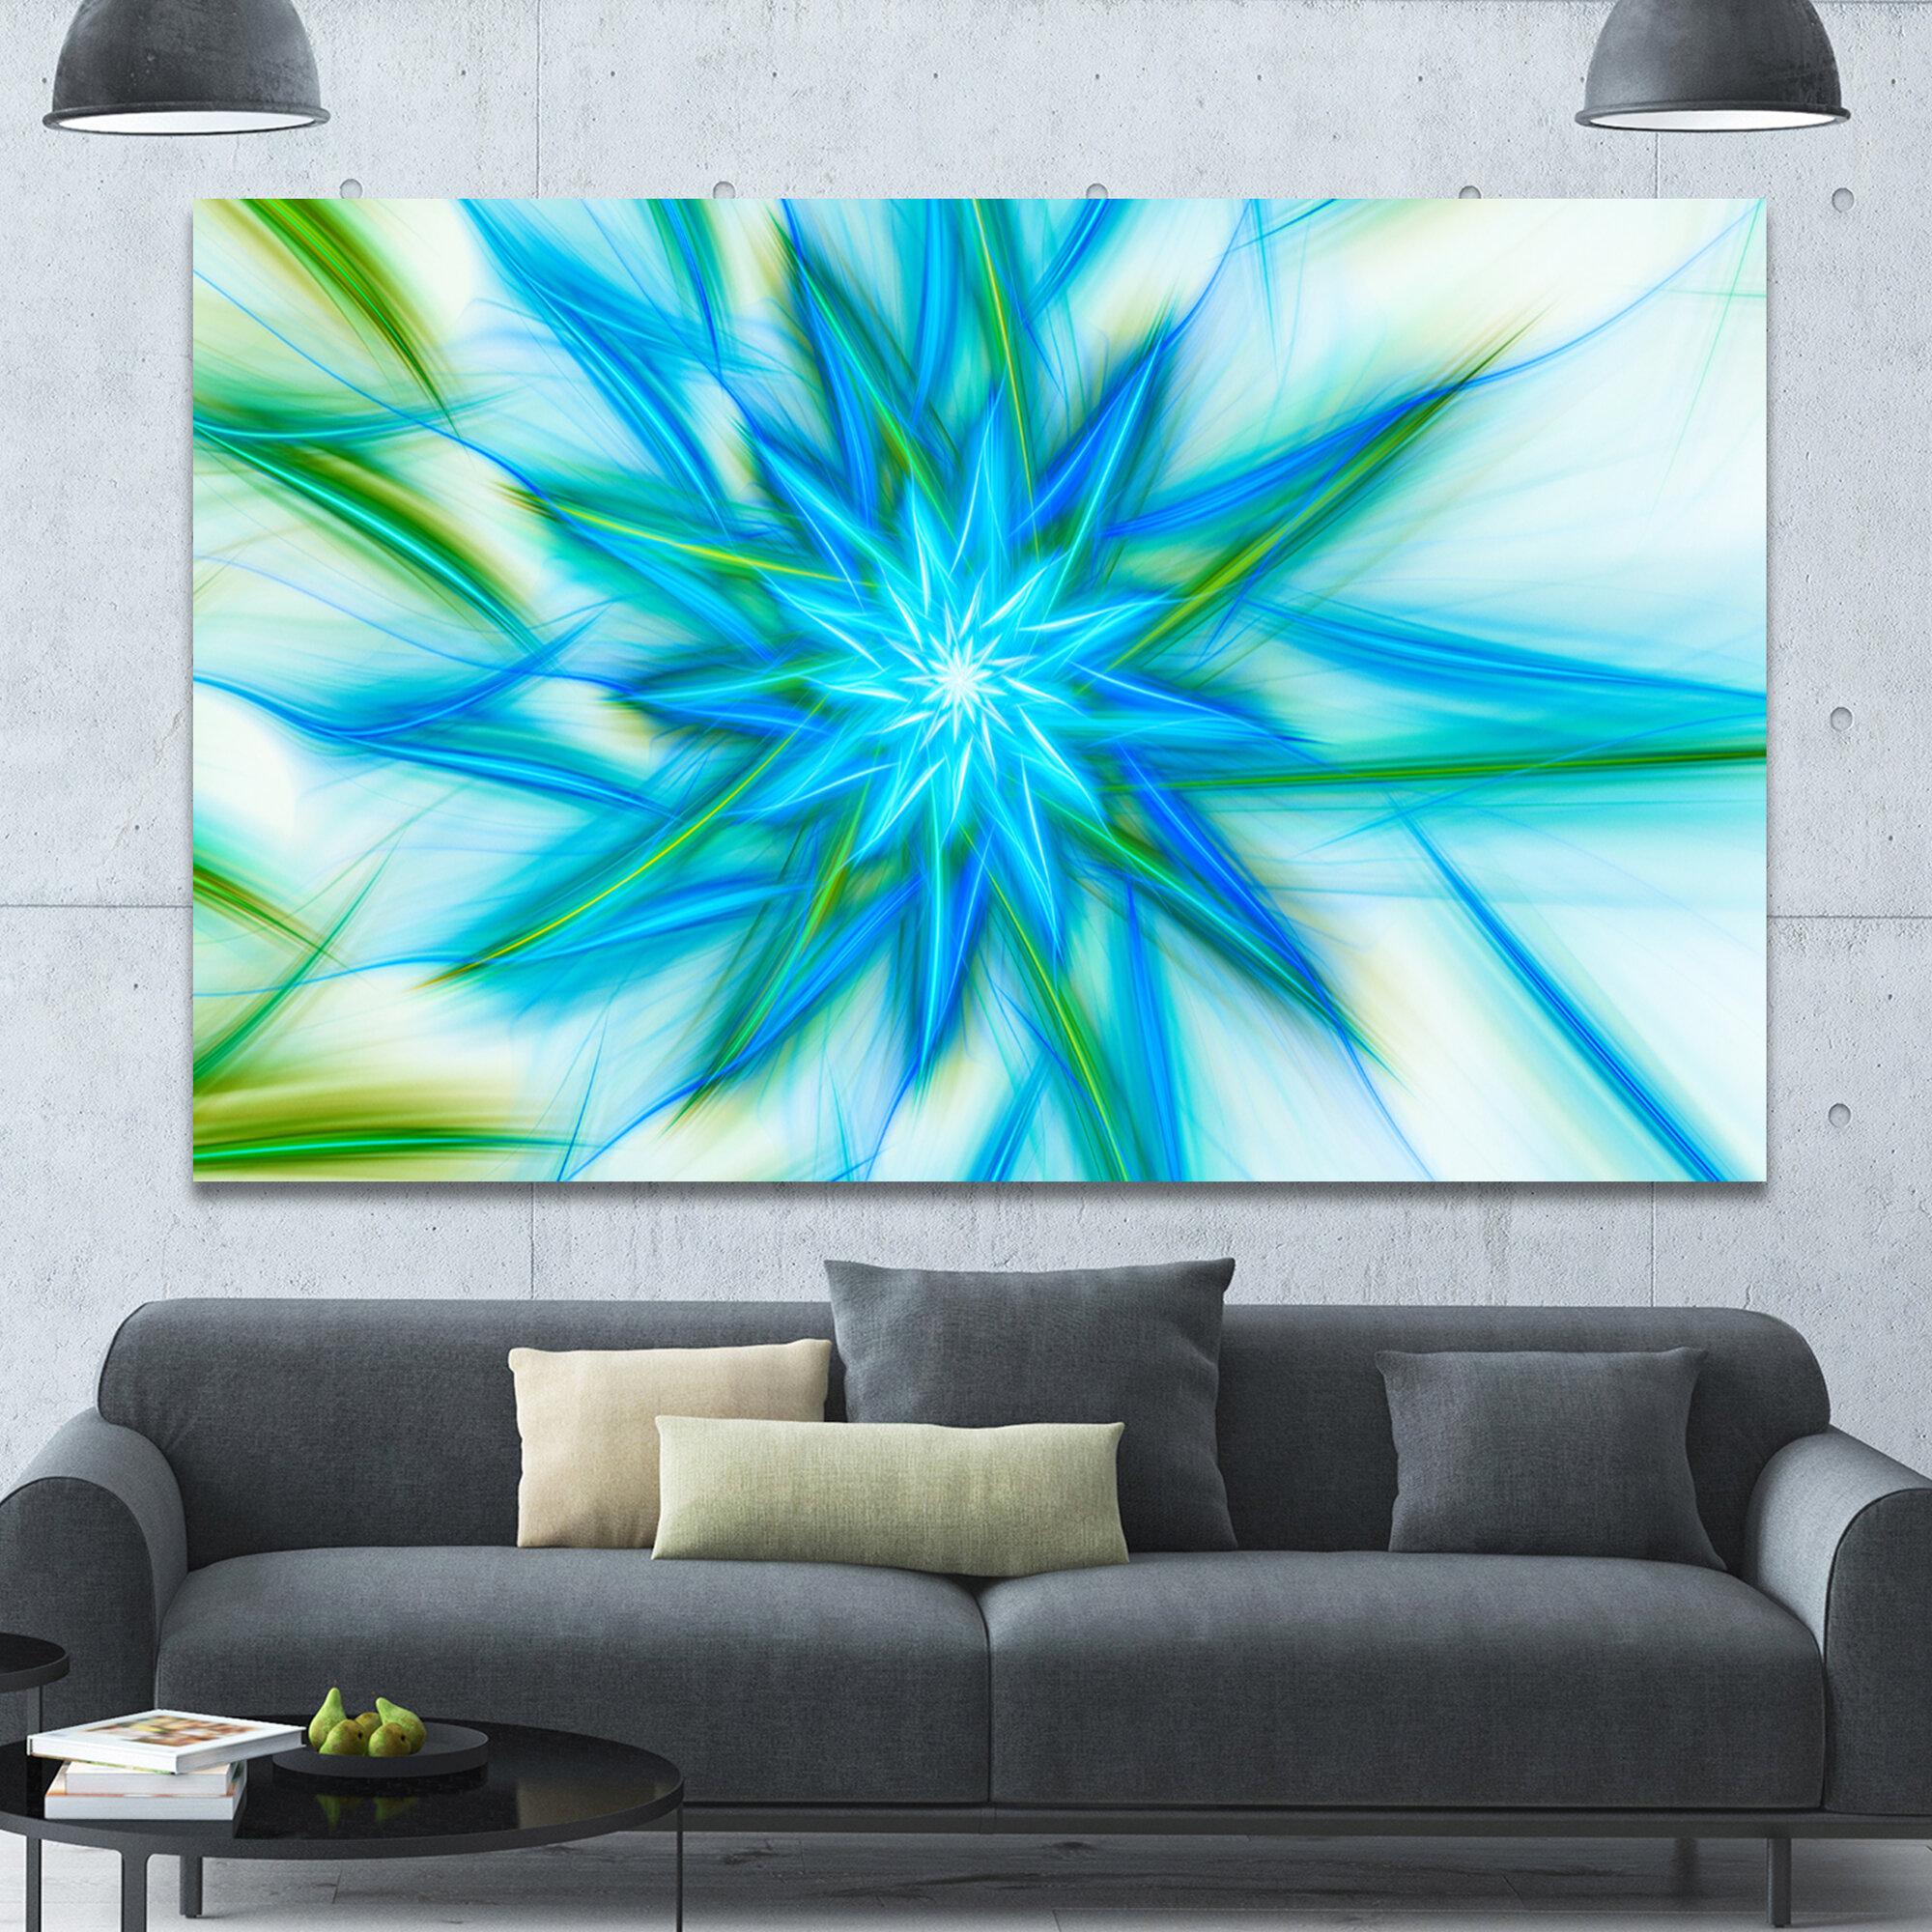 Designart Blue Fractal Shining Bright Star Graphic Art On Wrapped Canvas Wayfair